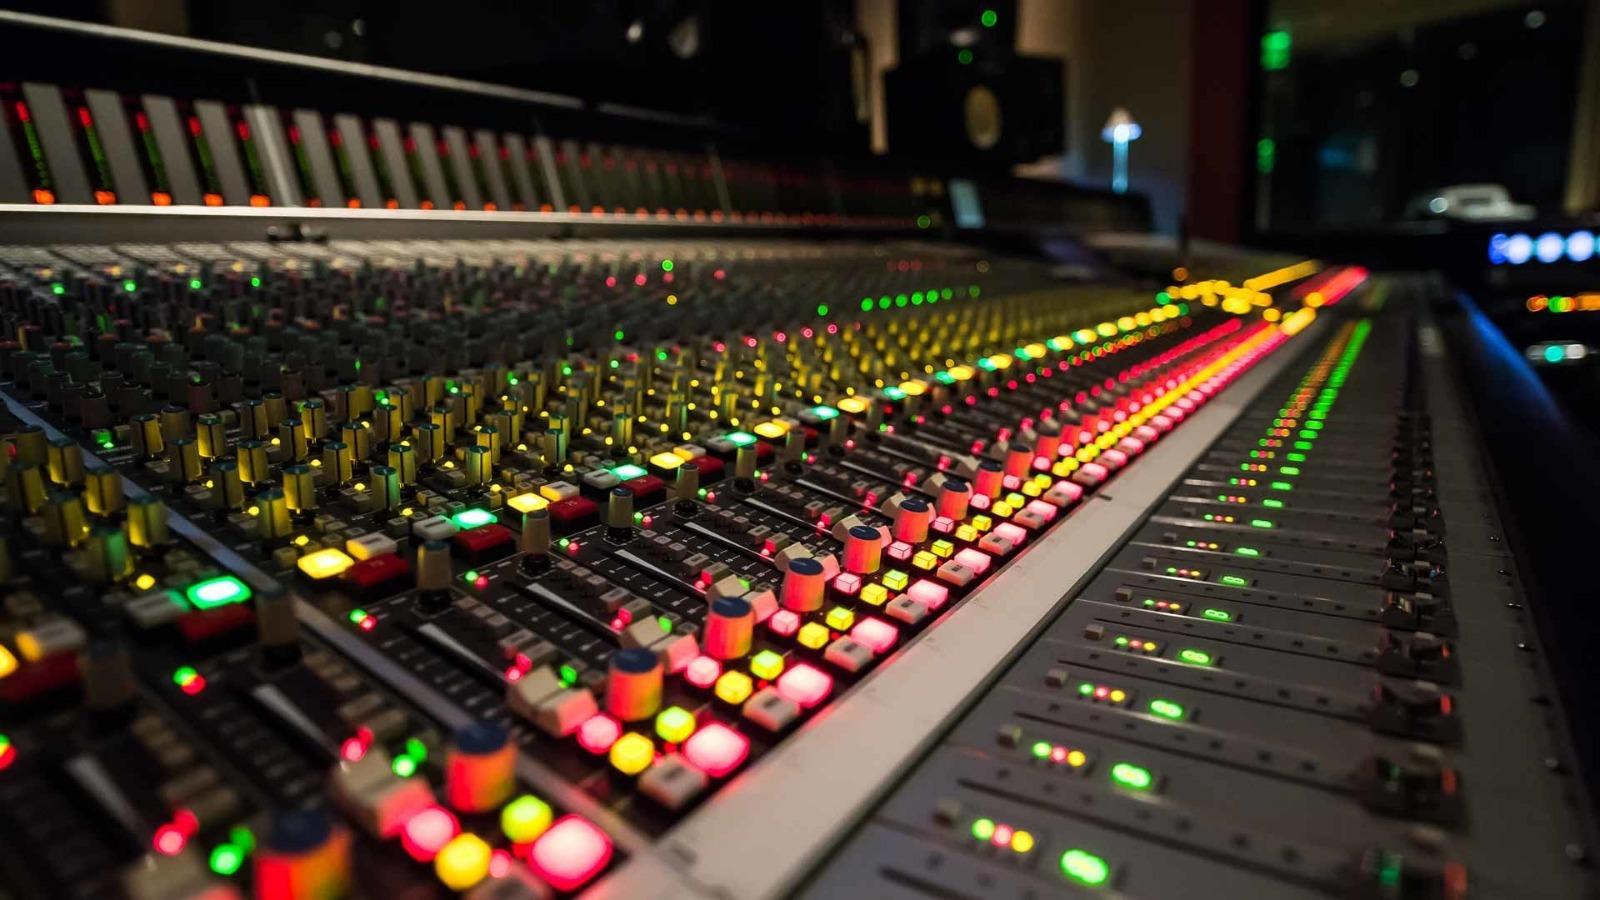 Producción Músical/Diseño de audio